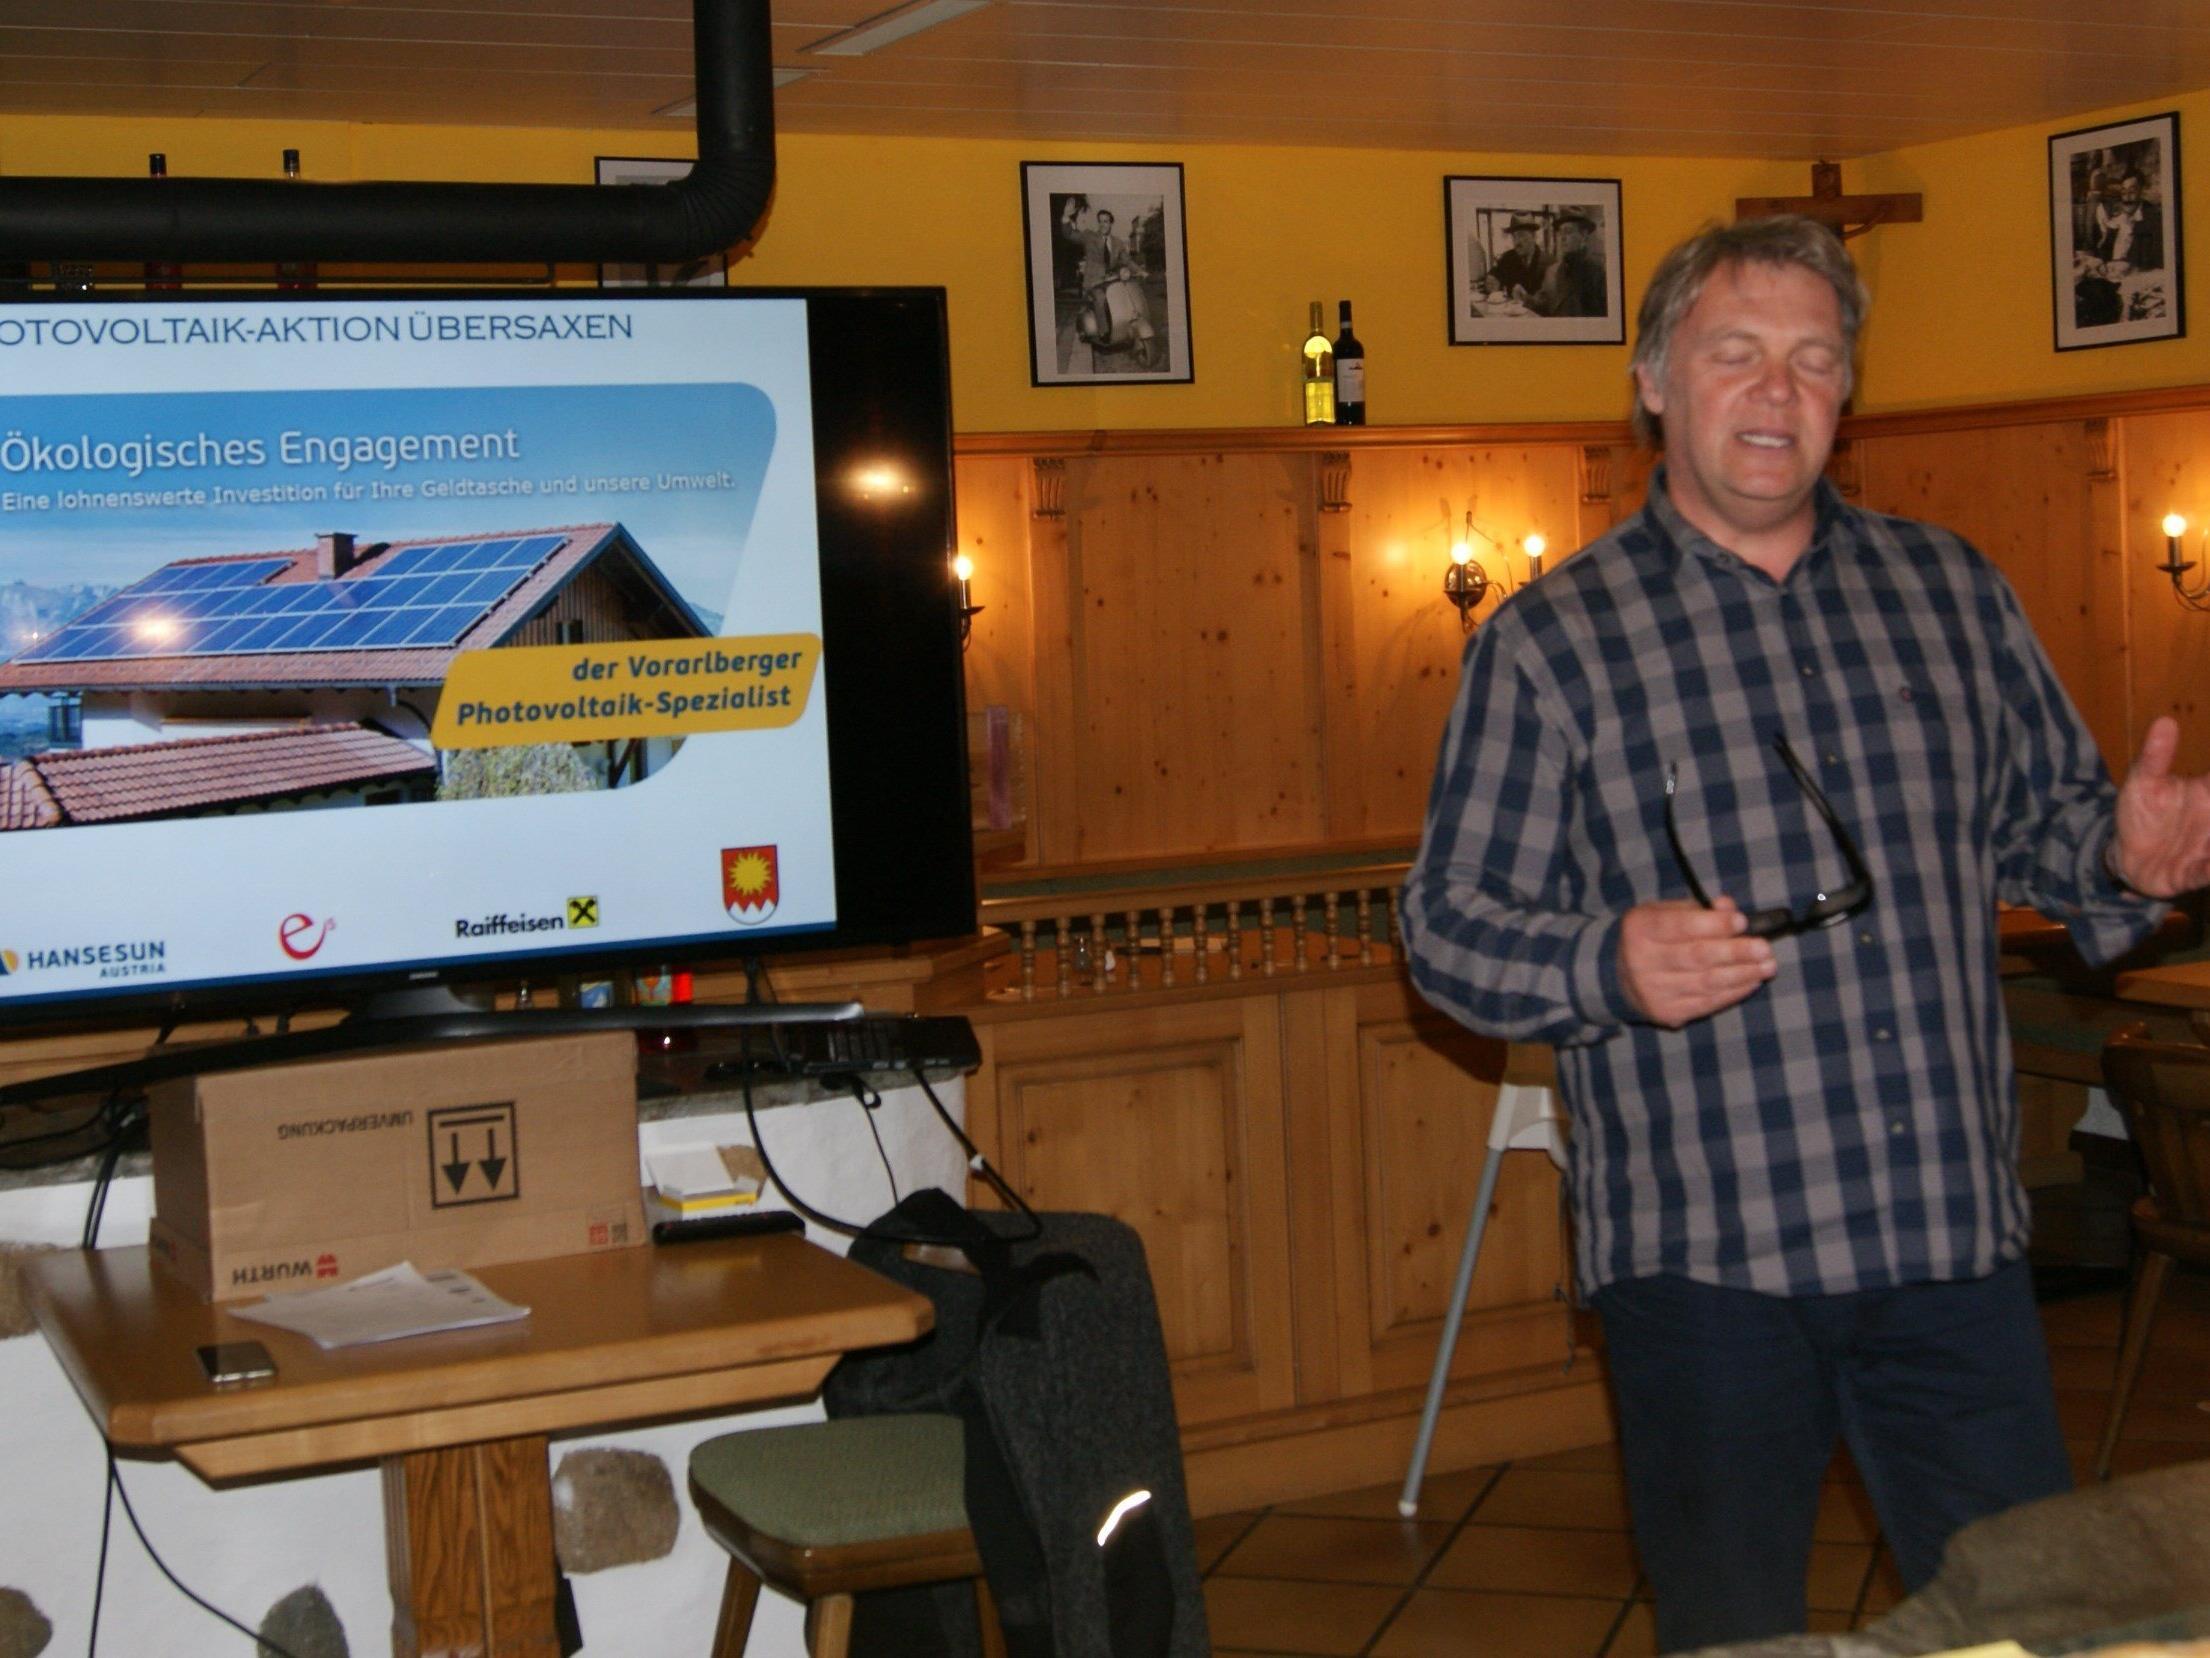 Photovoltaik-Experte Andreas Müller beim Vortrag